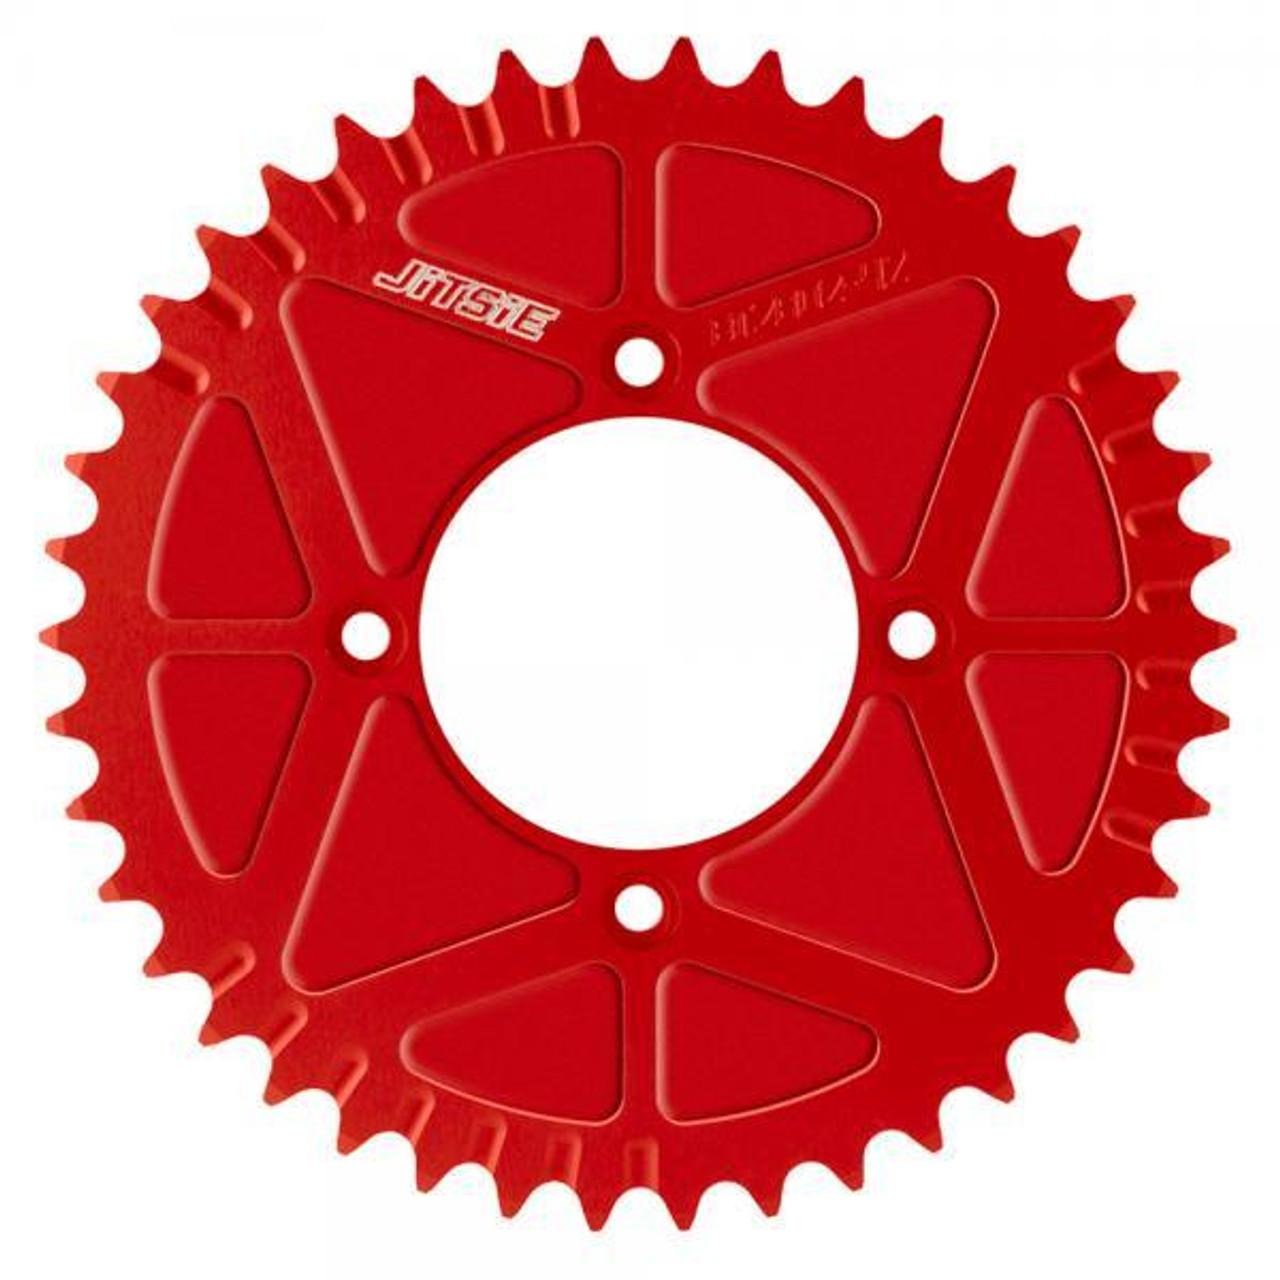 Jitsie solid rear sprocket red